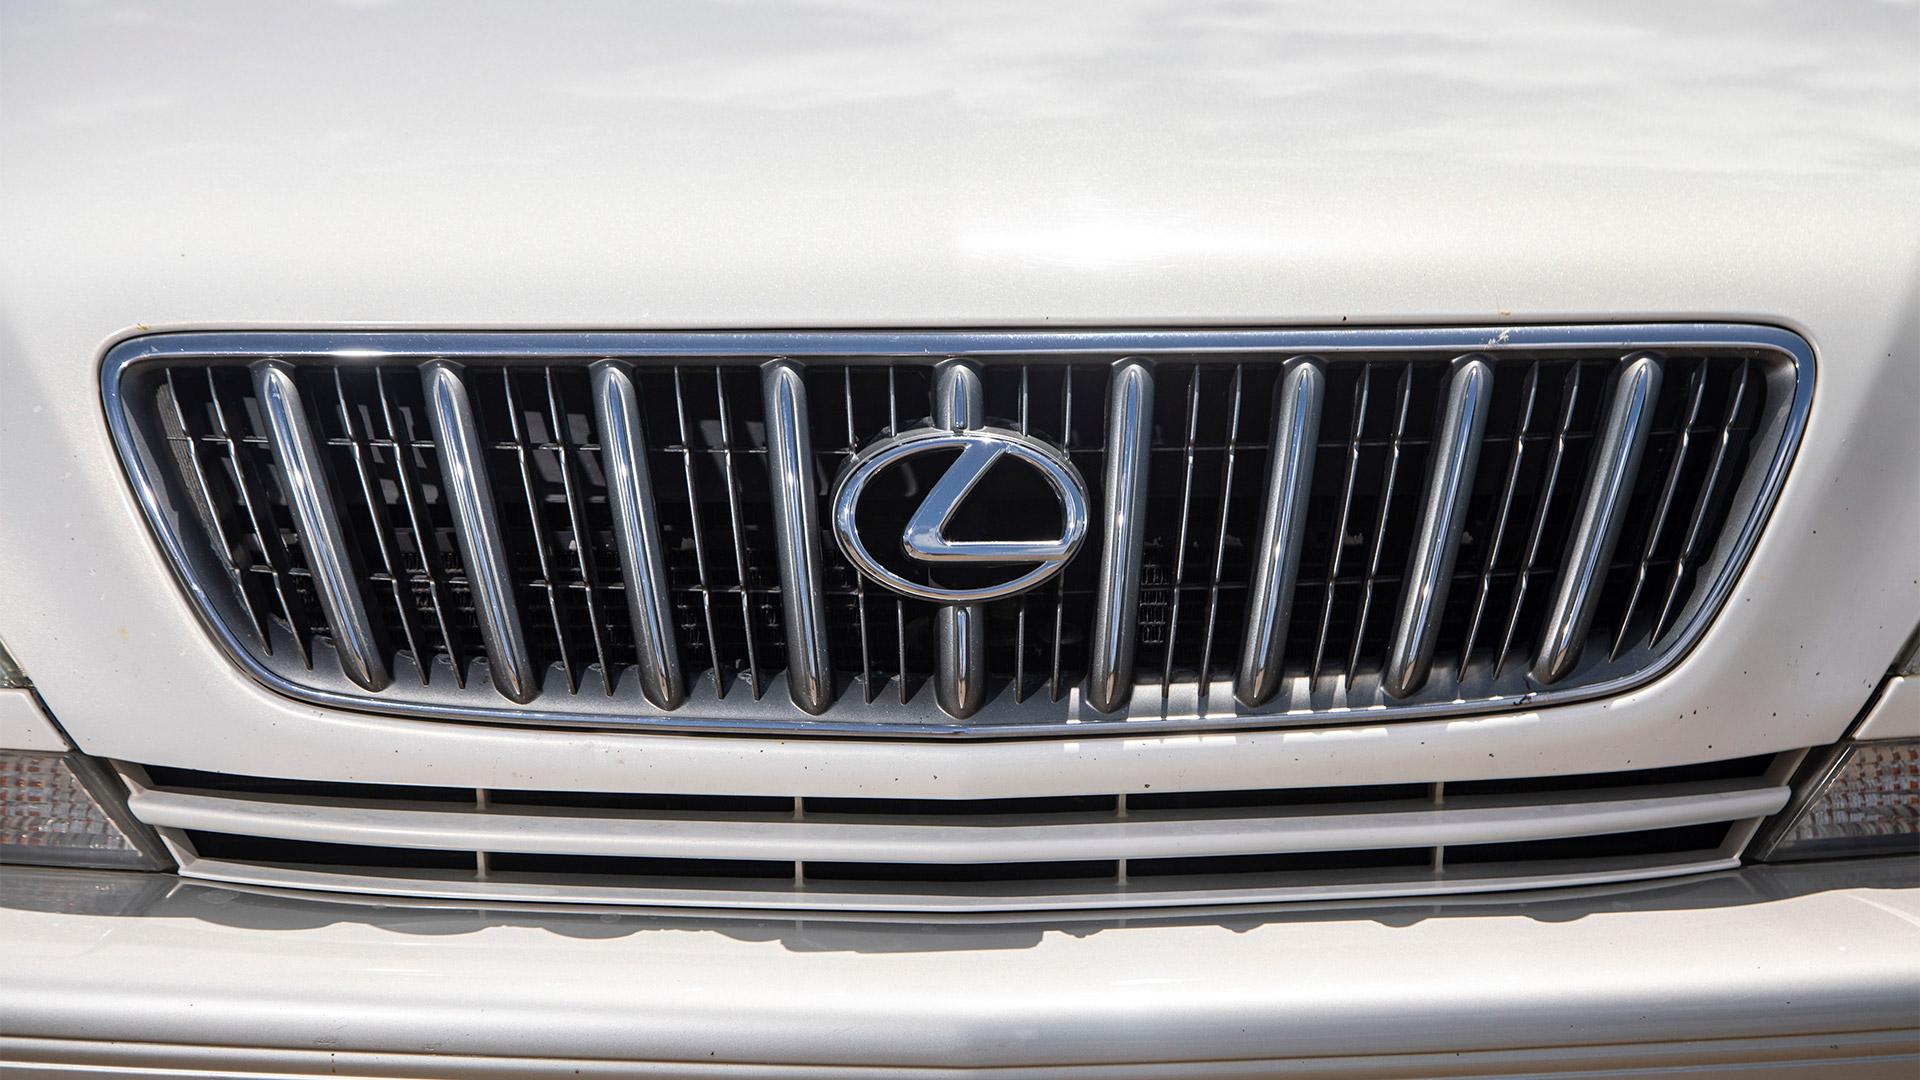 15 2019 020 Lexus RX pionier 1920x1080 galerij